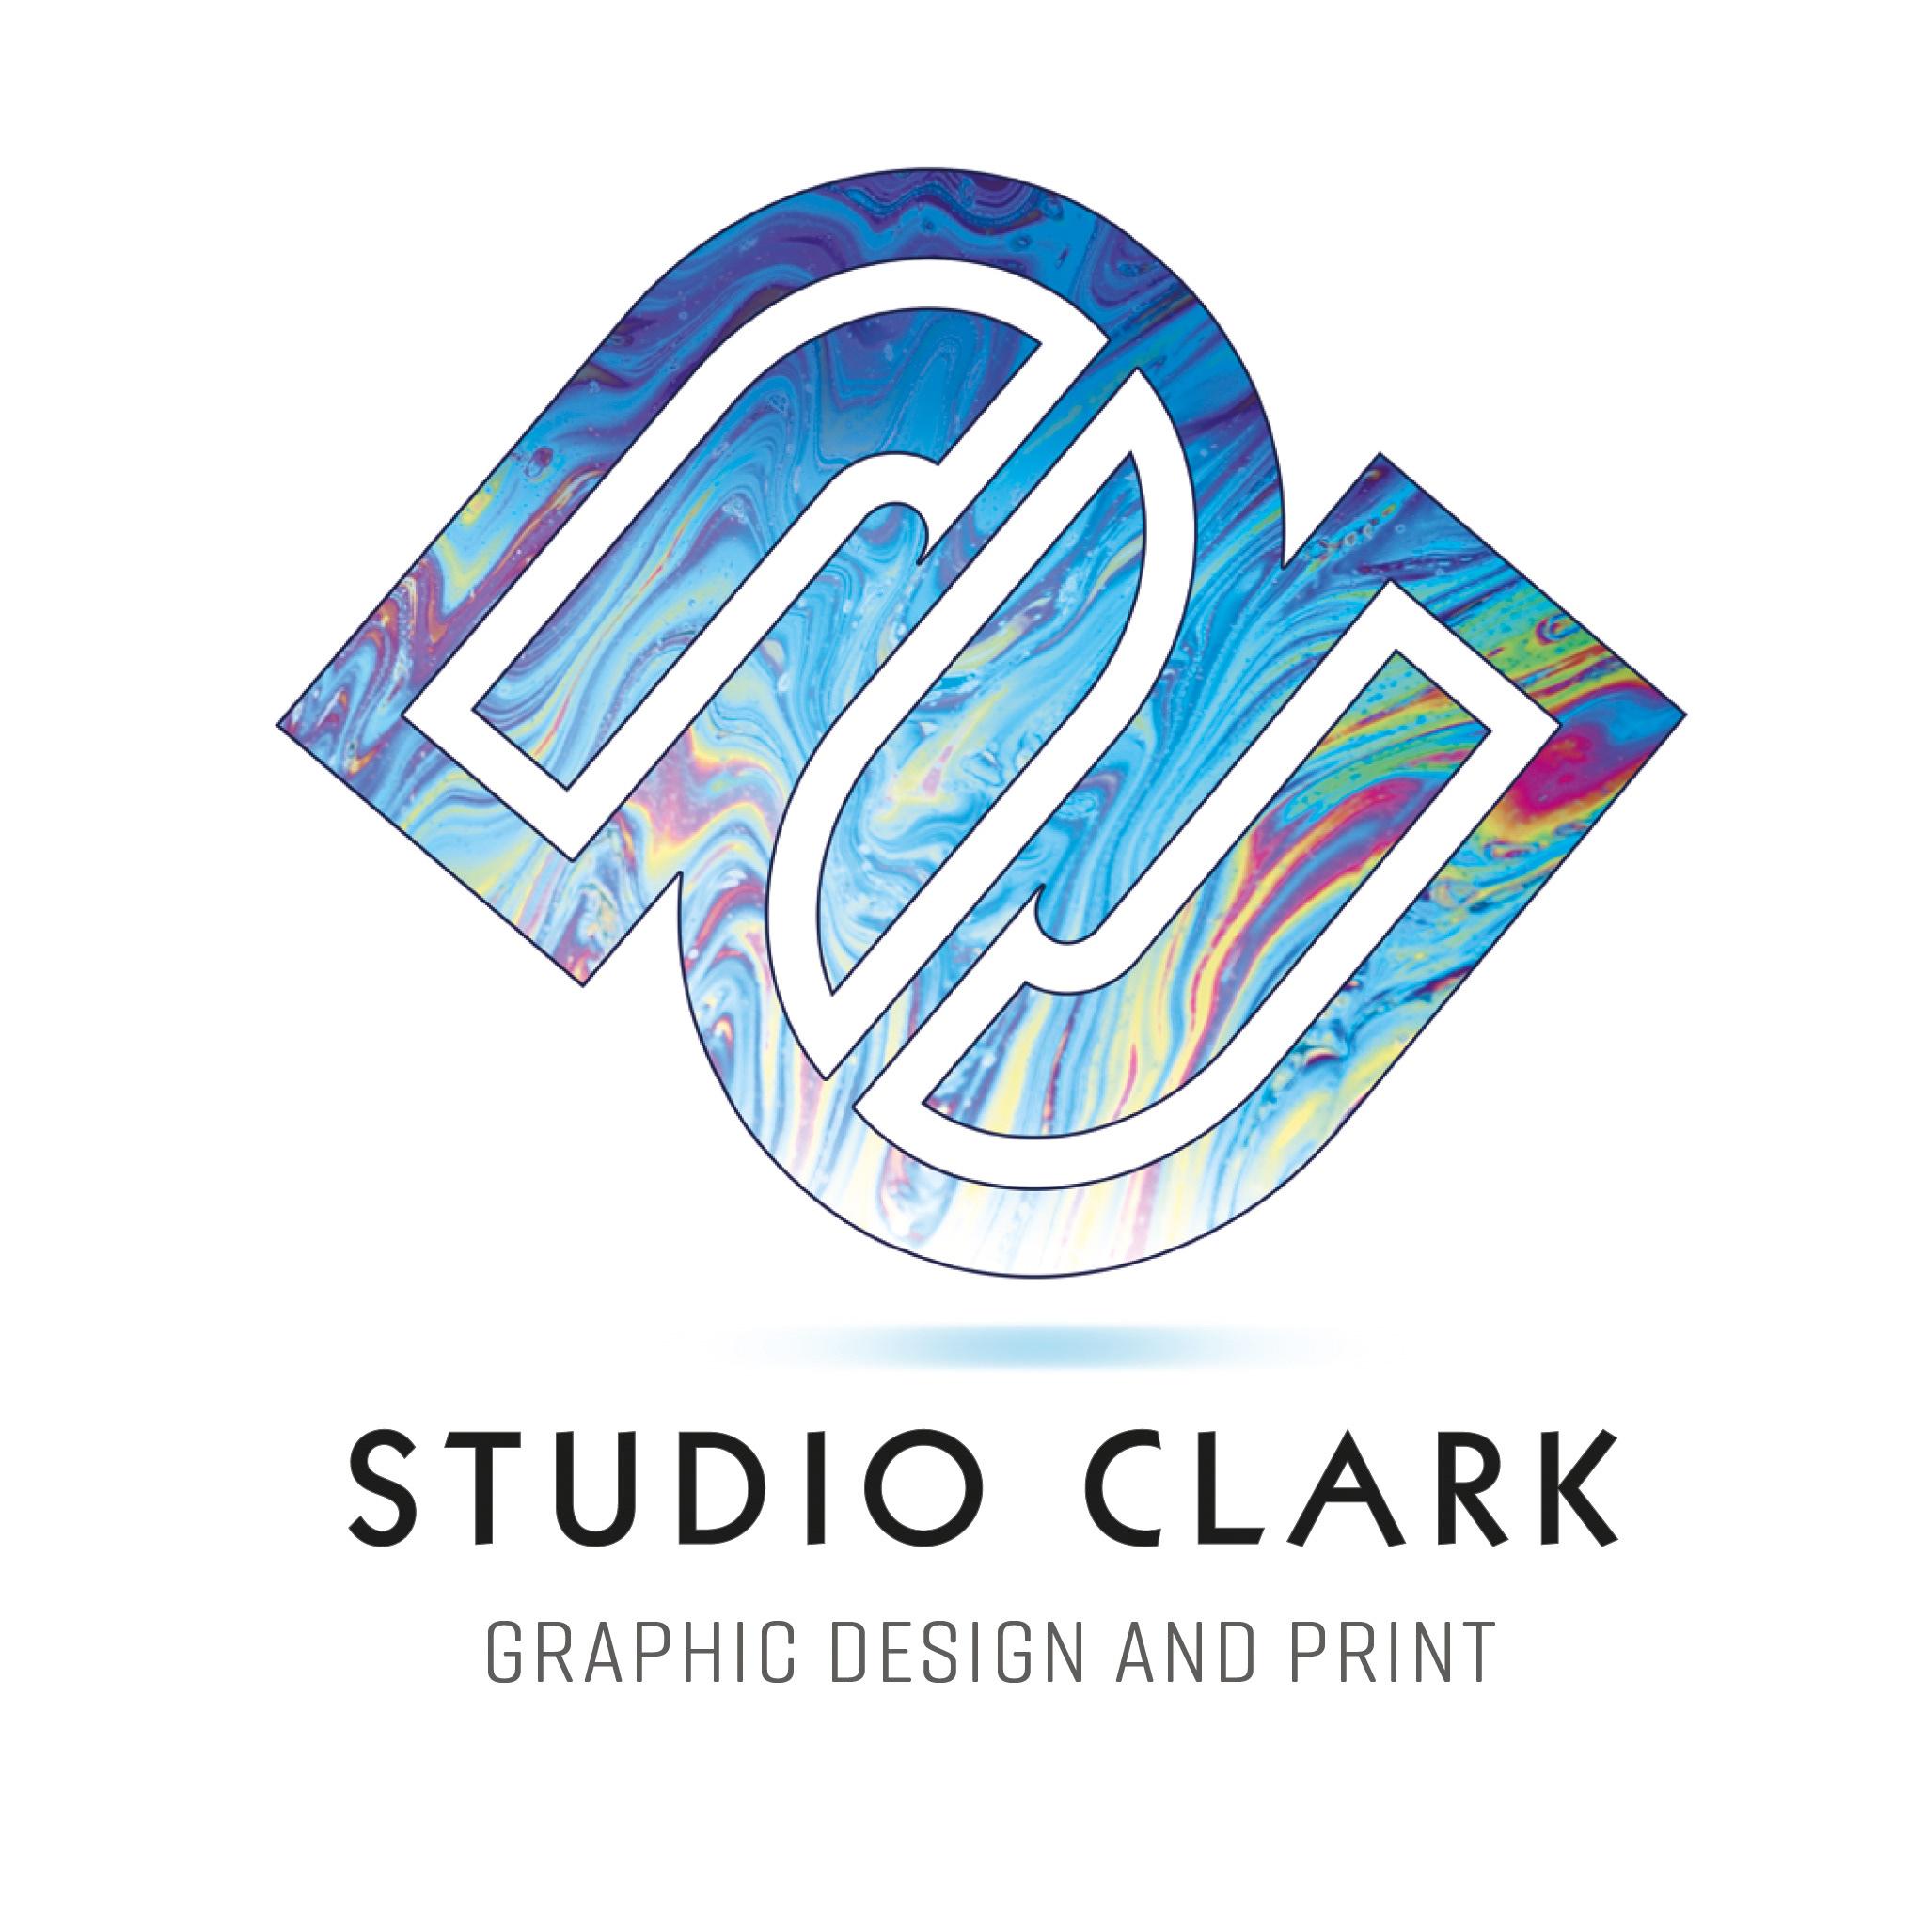 Studio Clark  Norfolk  Graphic Design  Photography  Illustration  Print